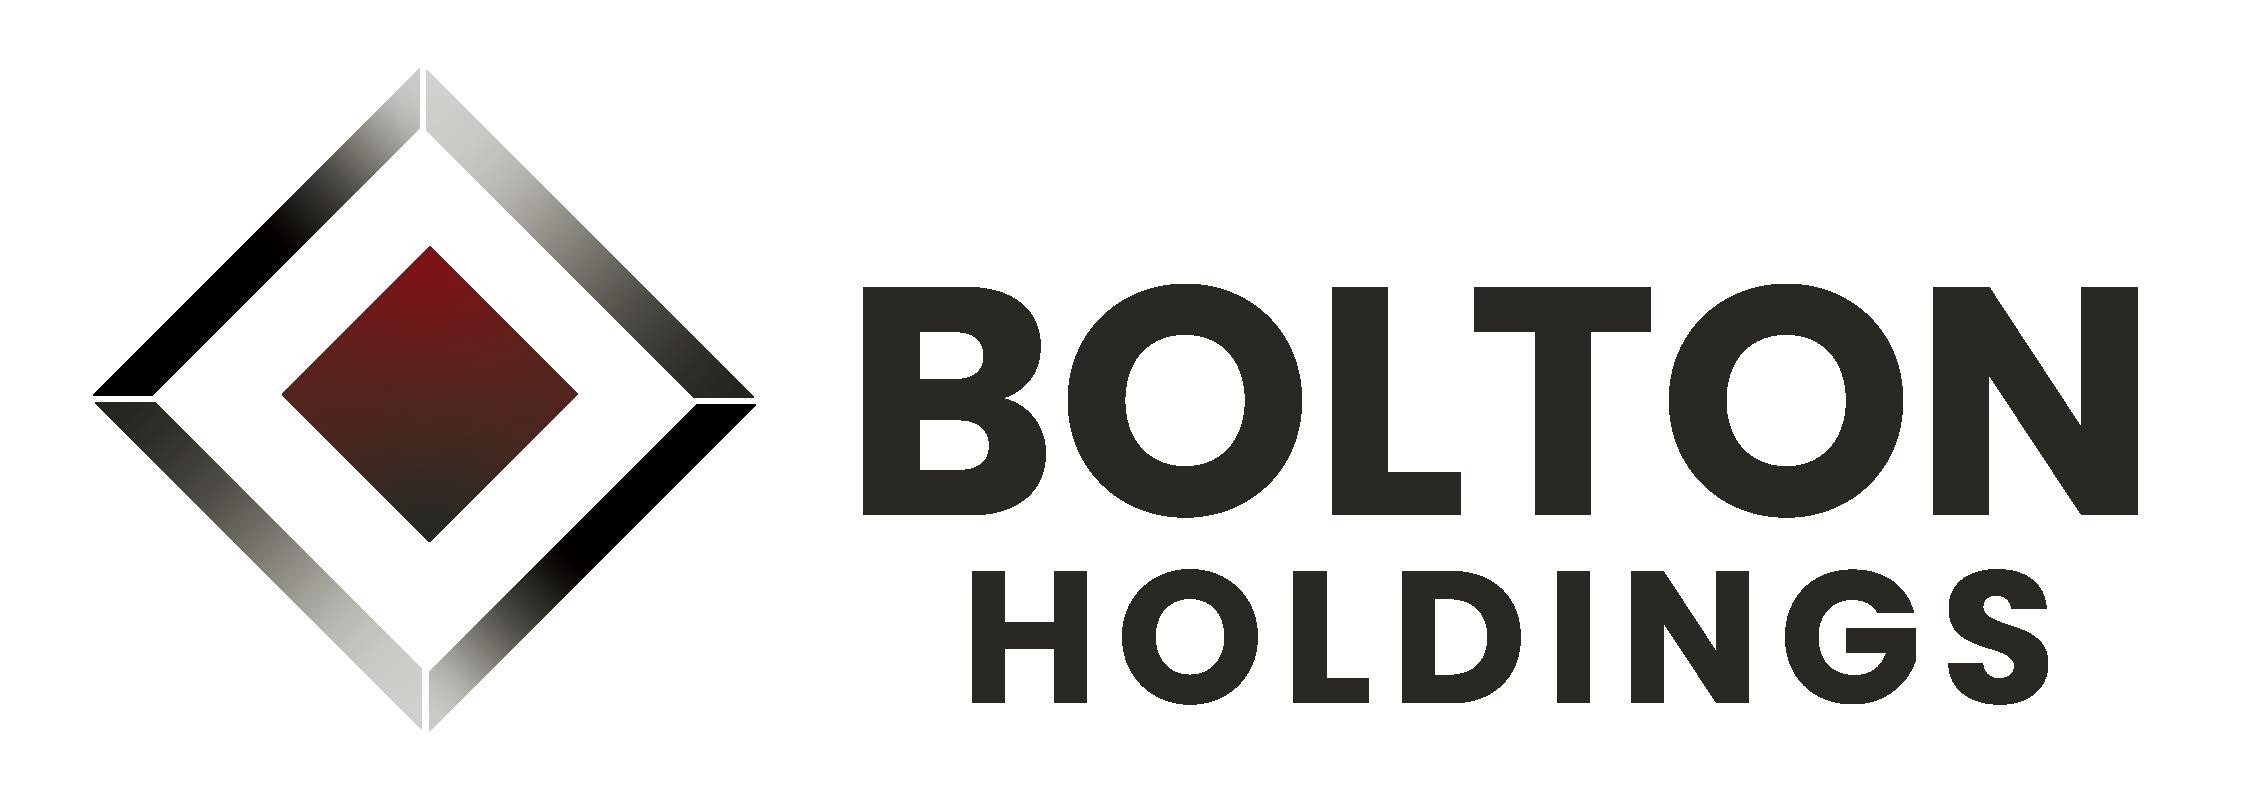 BOLTON HOLDINGS